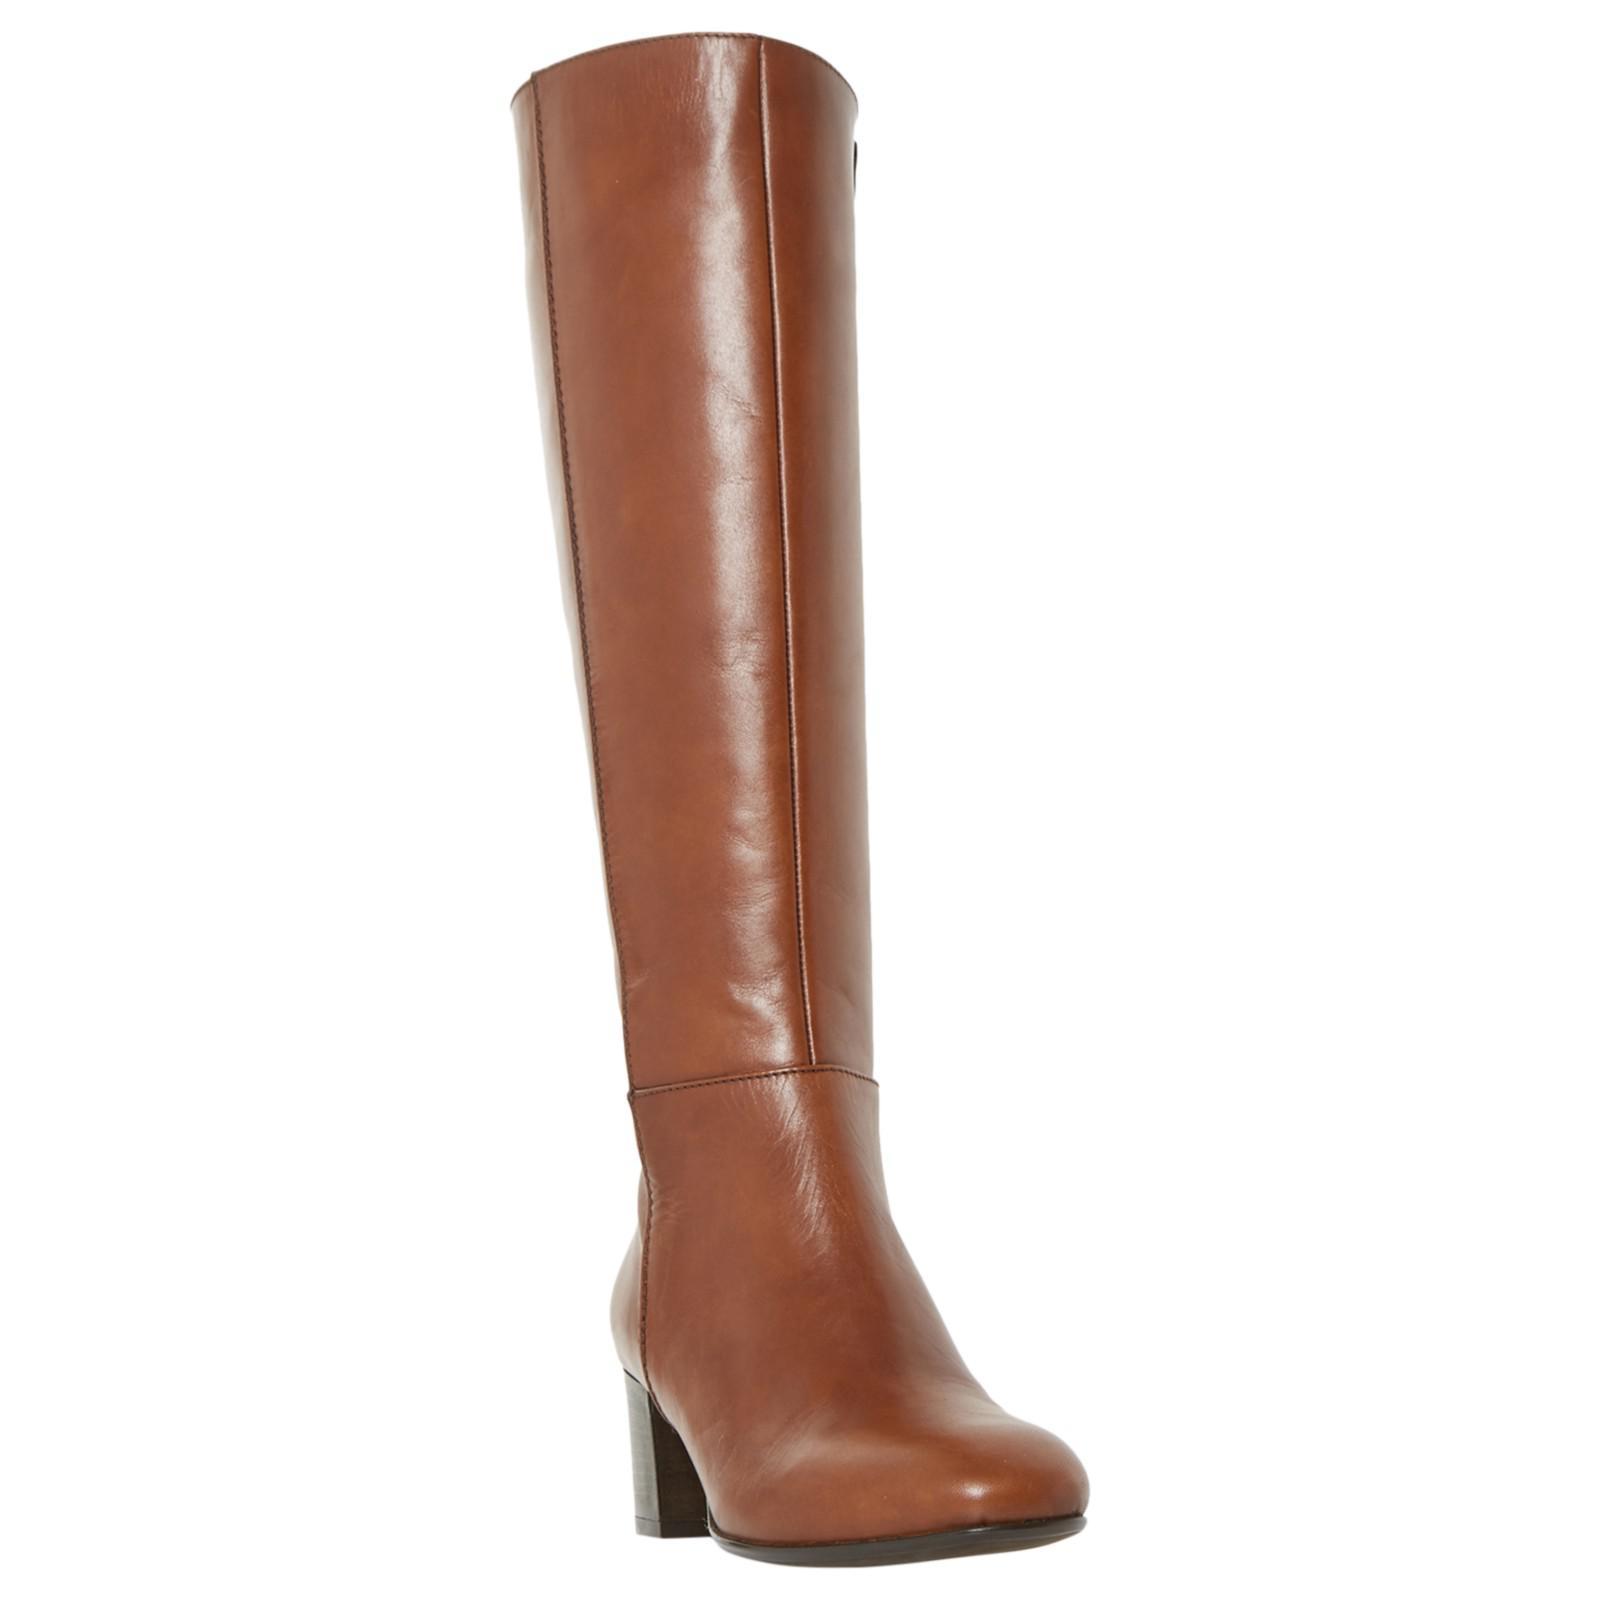 e6f9236c530 Dune Tarak Block Heeled Knee High Boots in Brown - Lyst